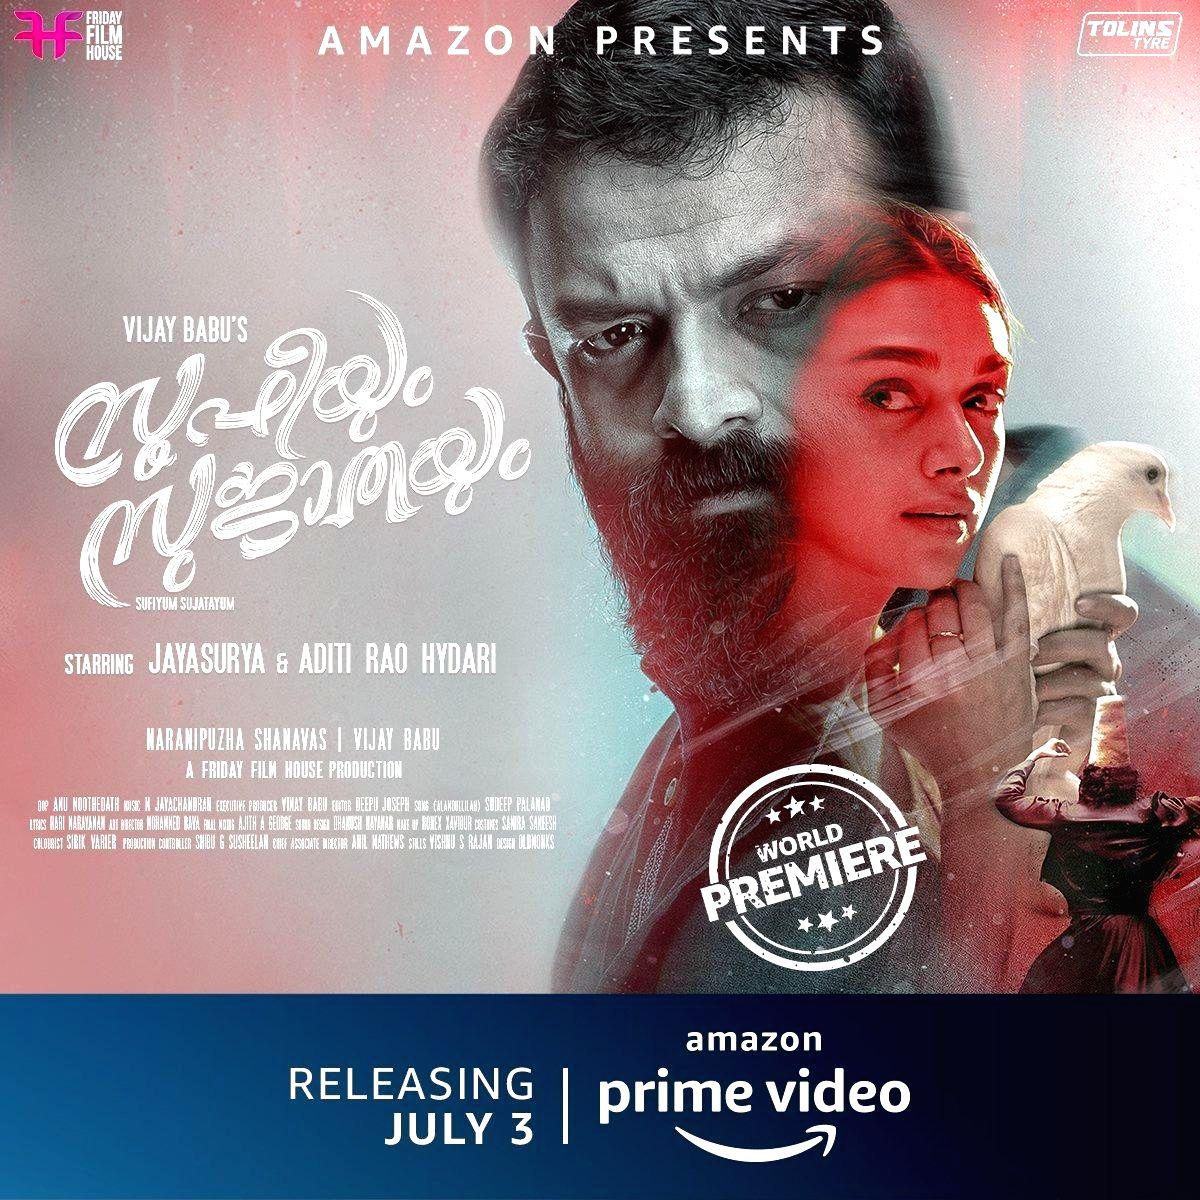 Amazon Prime Video released the trailer of Aditi Rao Hydari and Jayasuriya's upcoming musical romantic drama Sufiyan Sujatayum!.